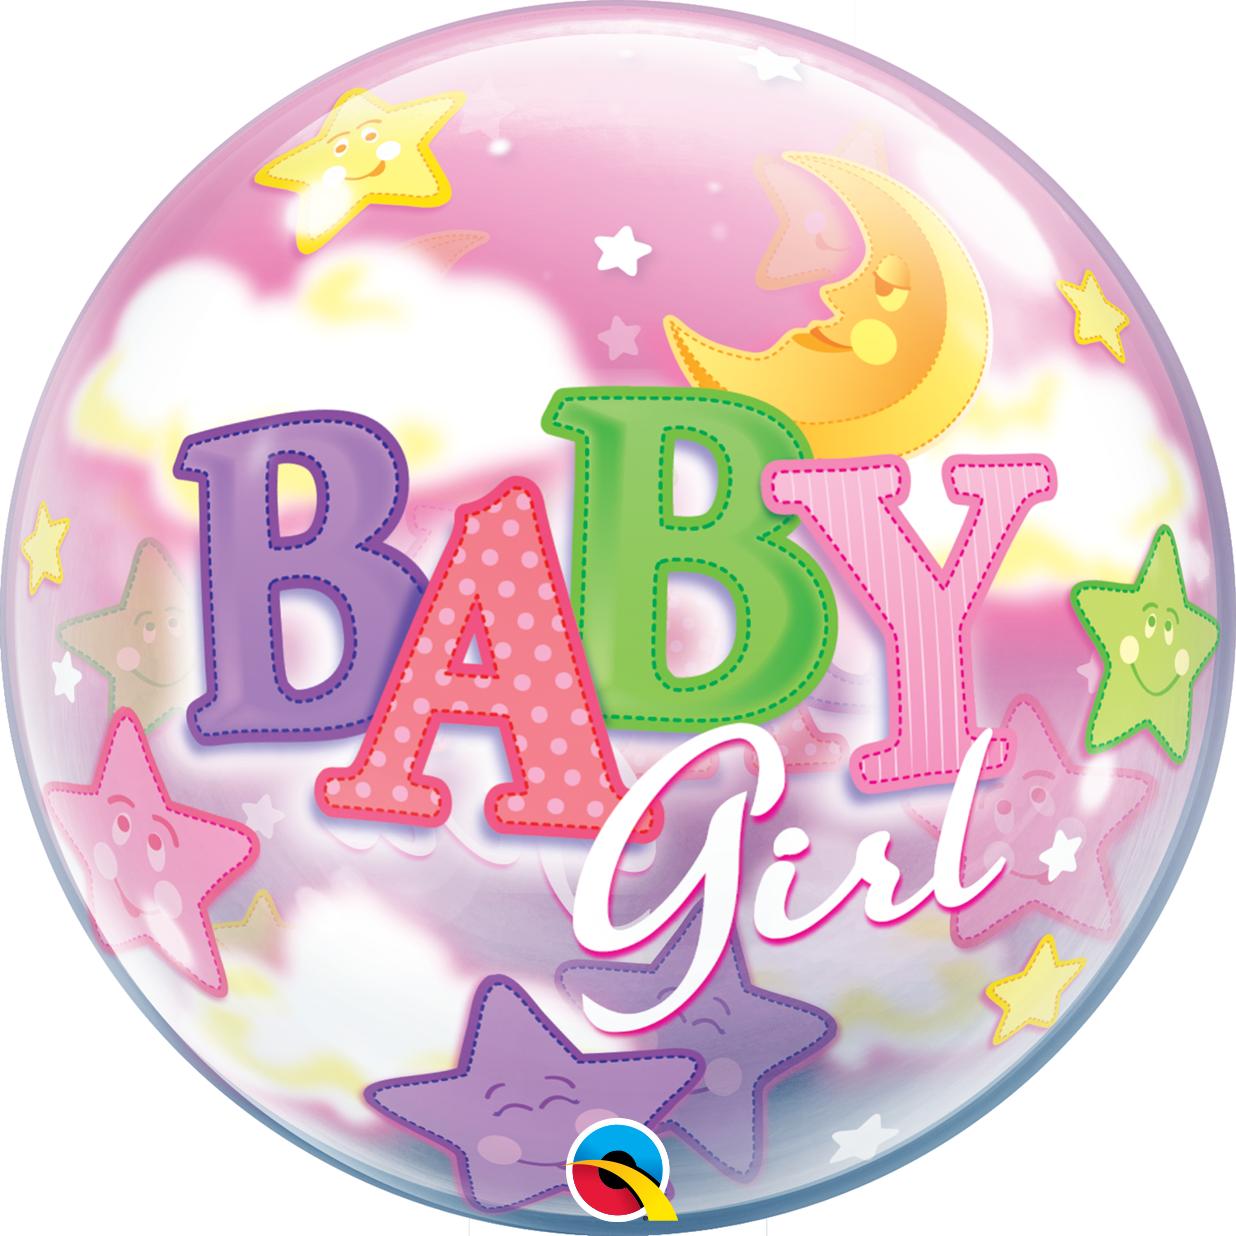 "Шар Bubble Бабл 22""/56 см Baby Girl Девочка и луна (Qualatex)"